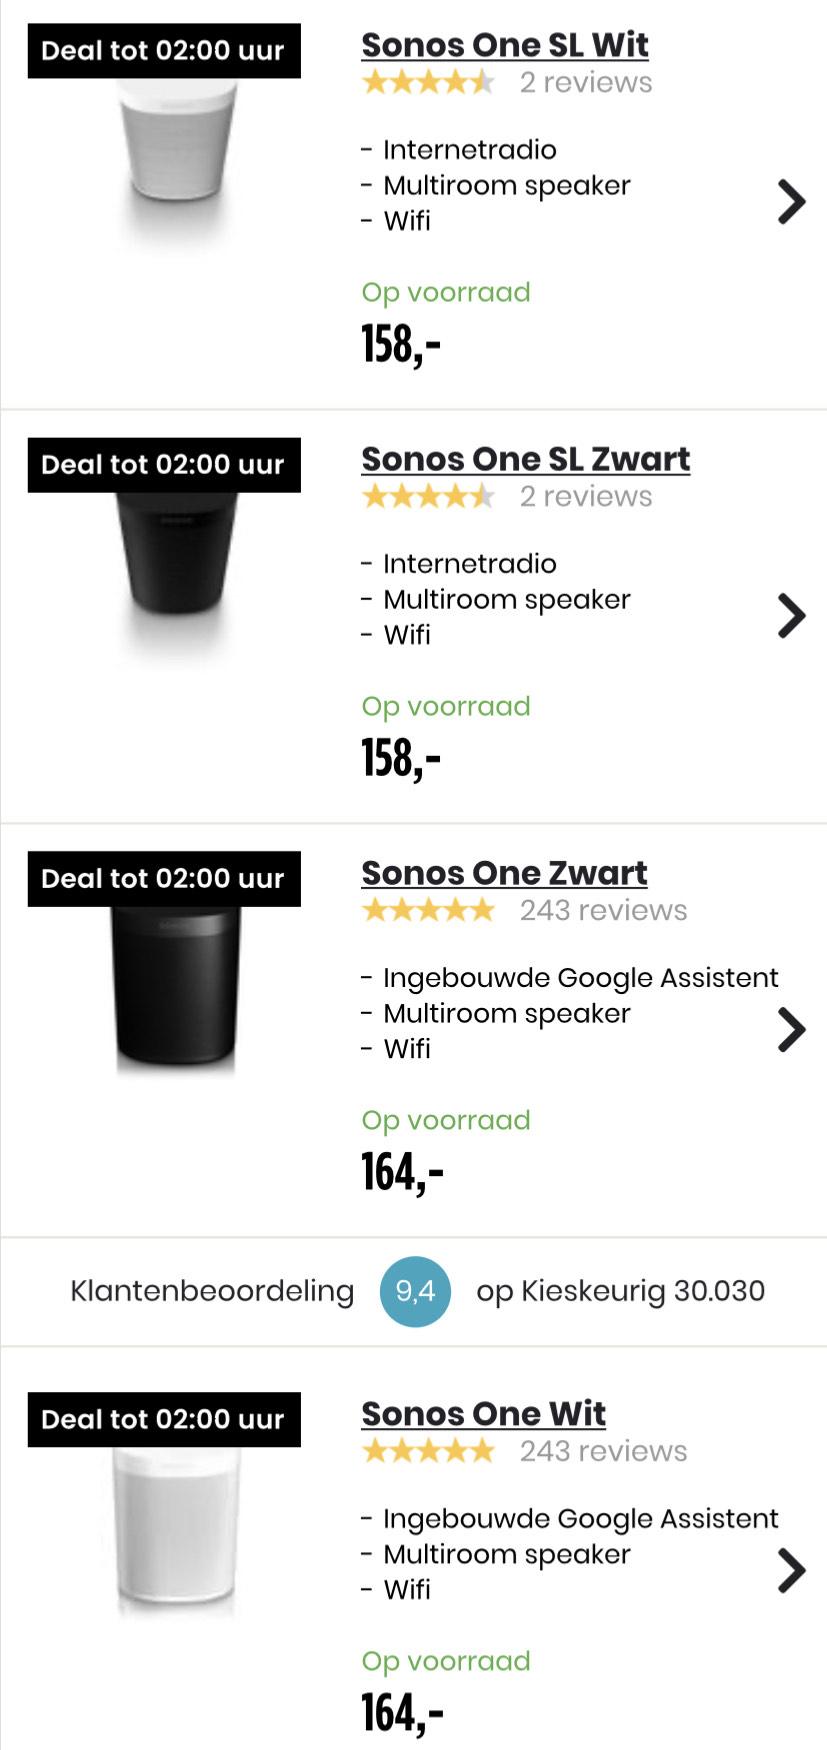 Sonos One € 164 | one SL € 158 tot 02.00 uur